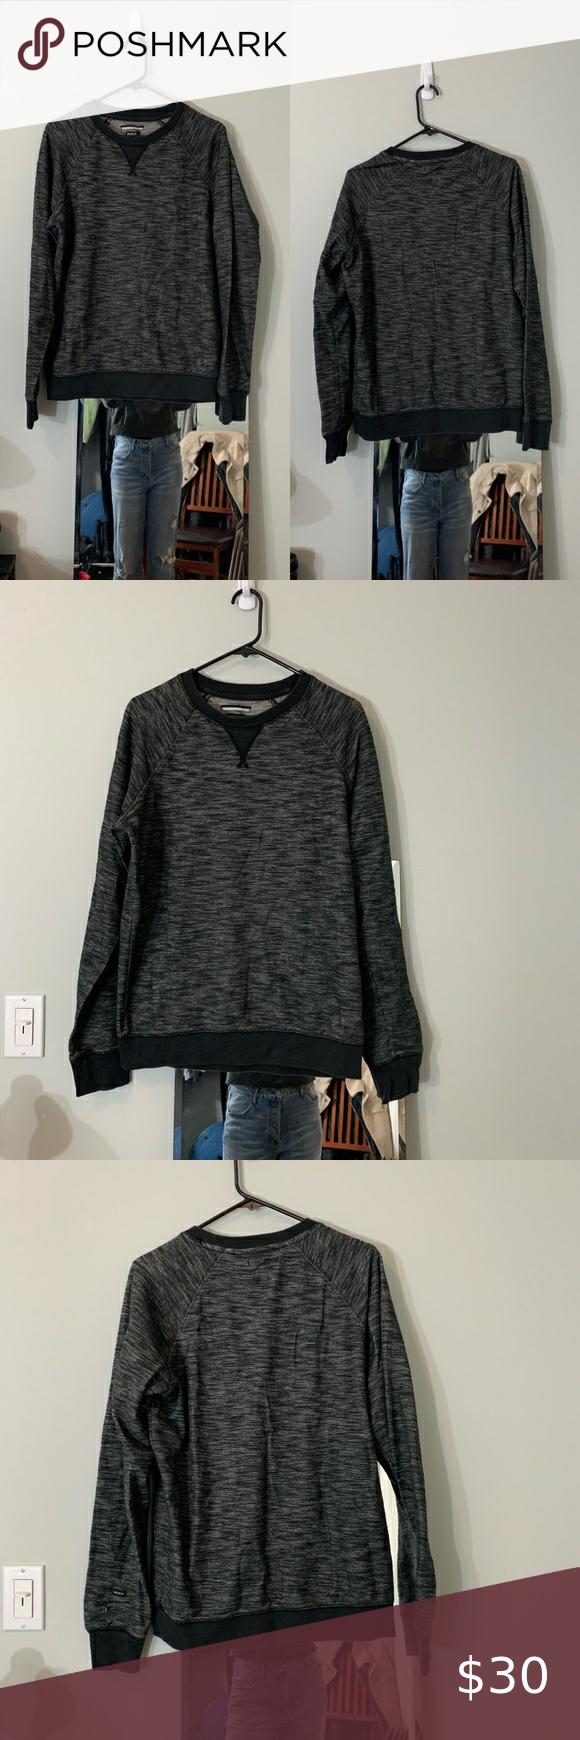 Rvca Dark Gray Heathered Crew Neck Sweatshirt Sz M Crew Neck Sweatshirt Sweatshirts Sweatshirt Shirt [ 1740 x 580 Pixel ]